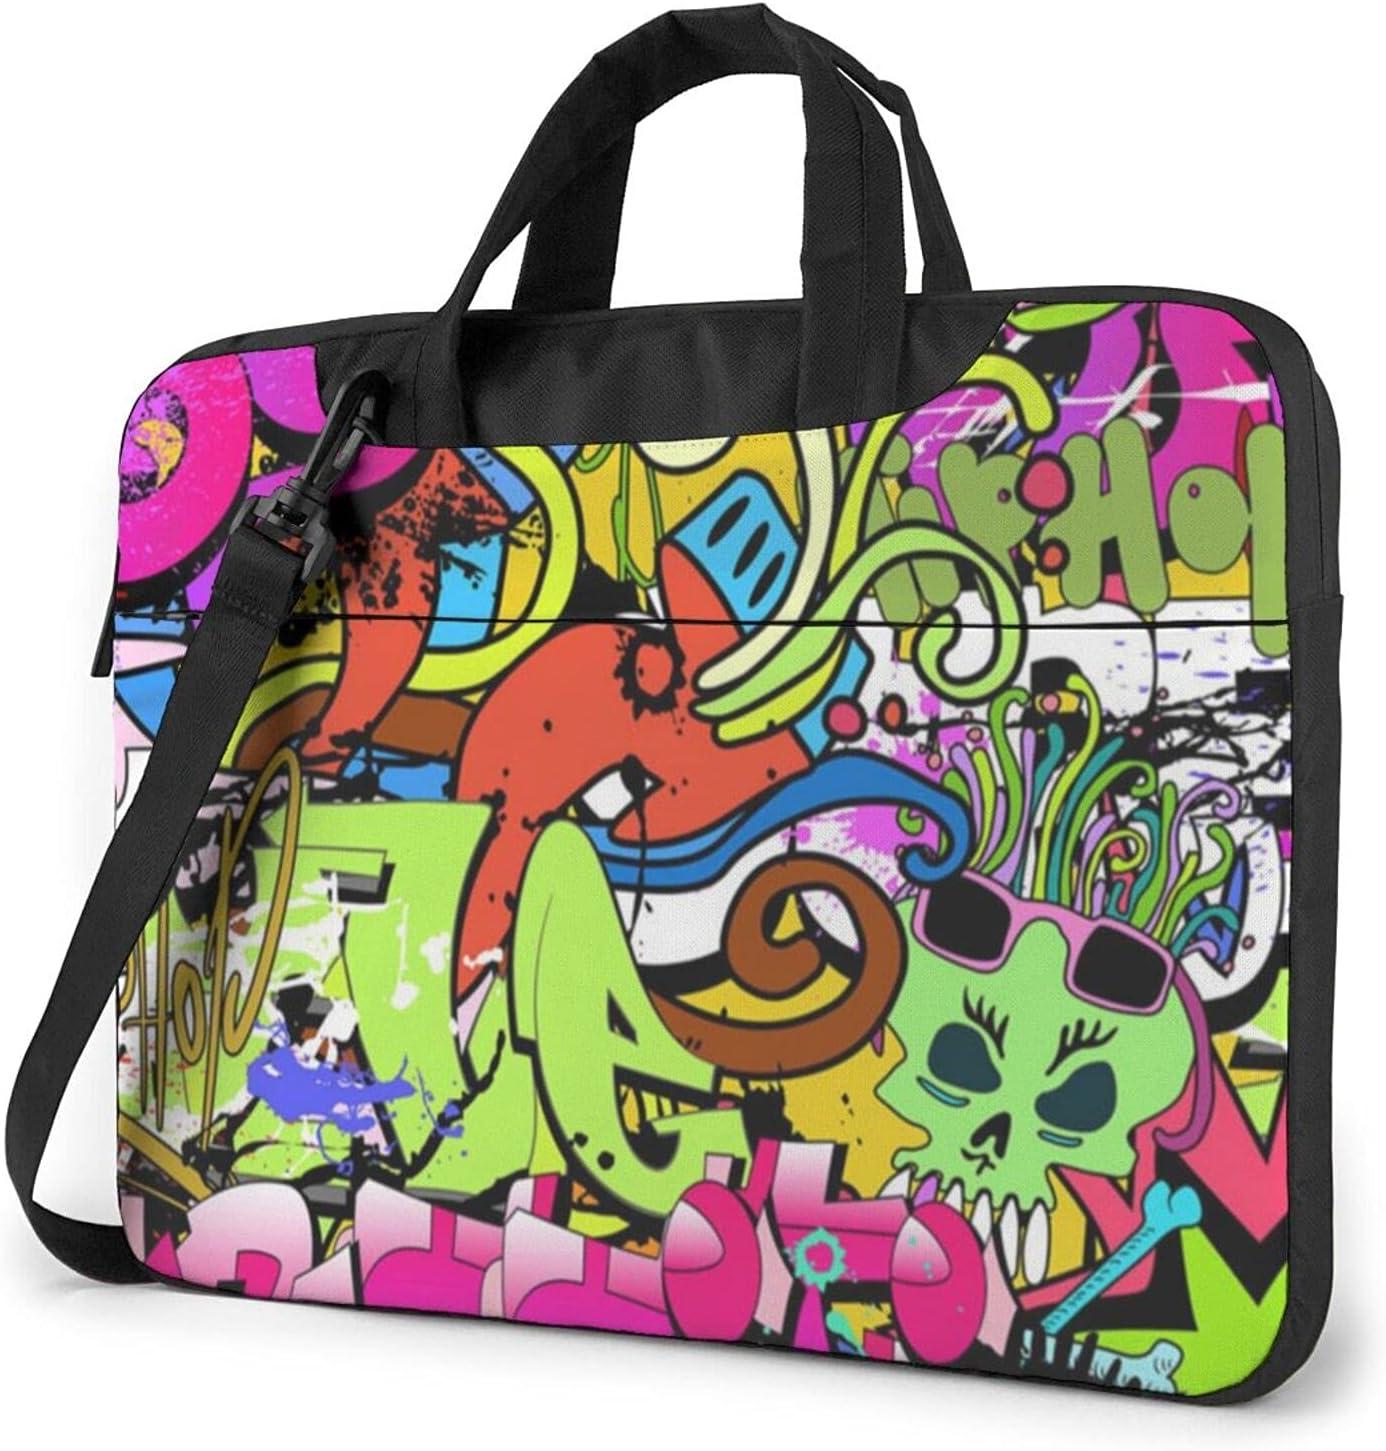 Funky Wall Art Classic Popular Slim Bag De Crossbody Briefcase It is very popular Shoulder